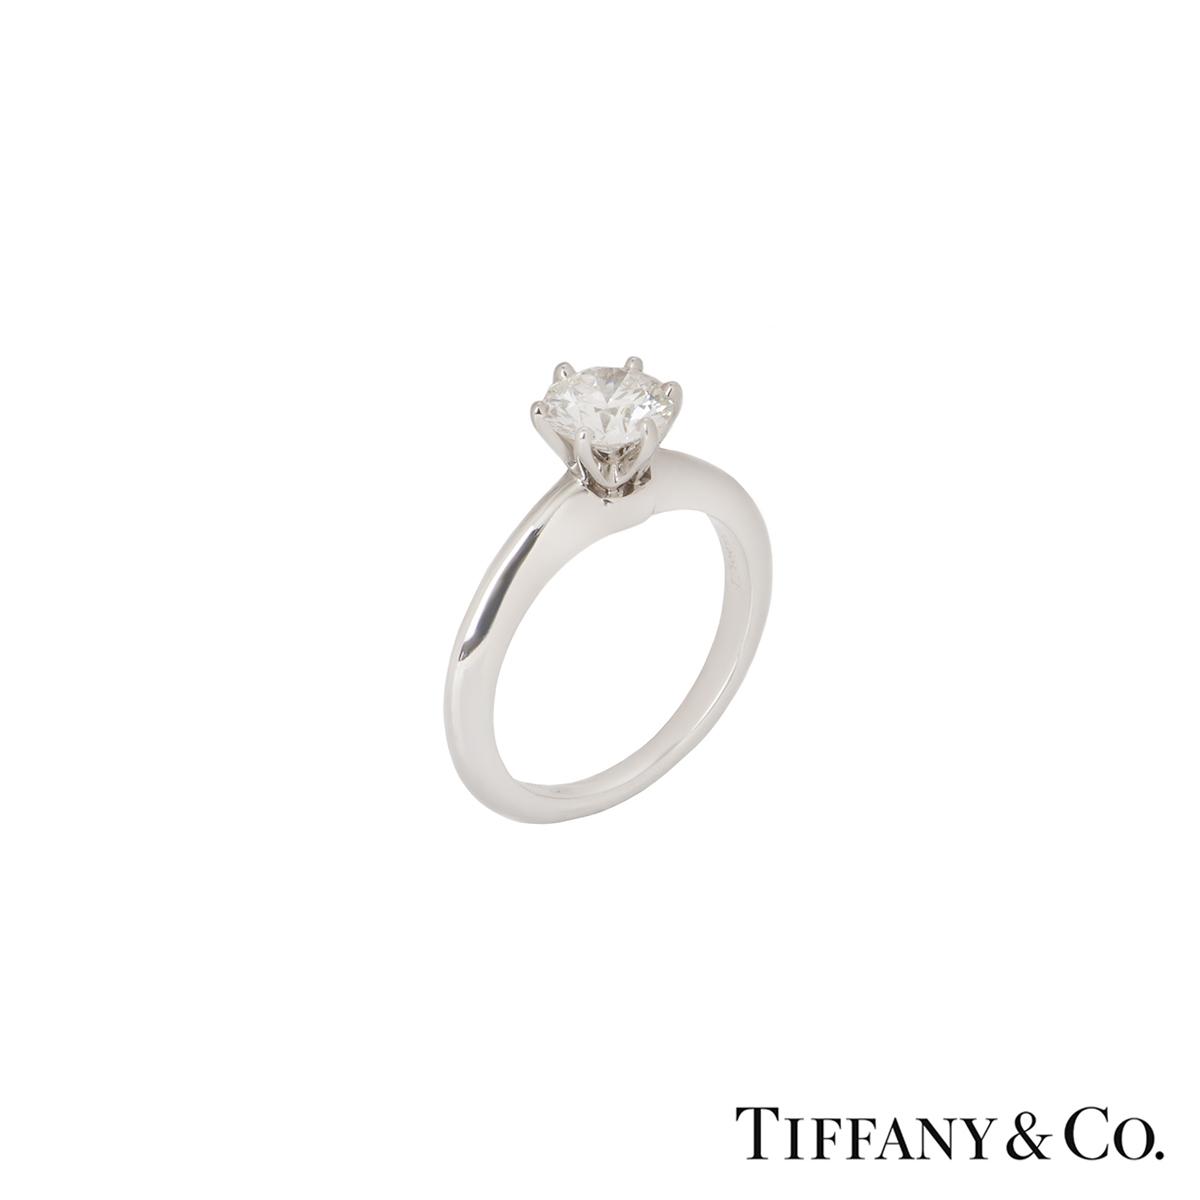 Tiffany & Co. Platinum Diamond Setting Ring 0.86ct I/VS1 XXX